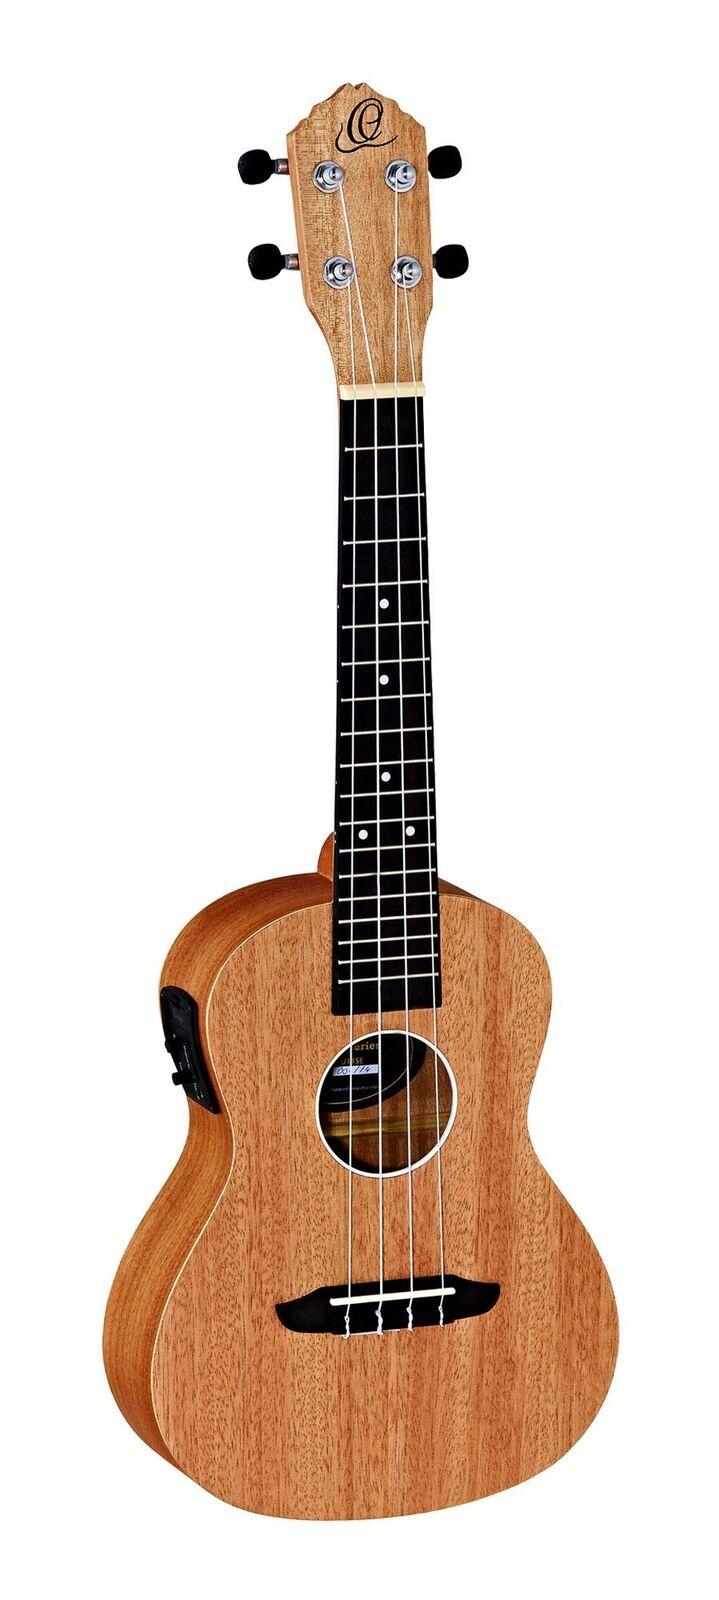 Ortega rfu11se concierto ukelele uke uke uke Hawaii guitarra fonocaptor Bag bolso naturaleza 97489b